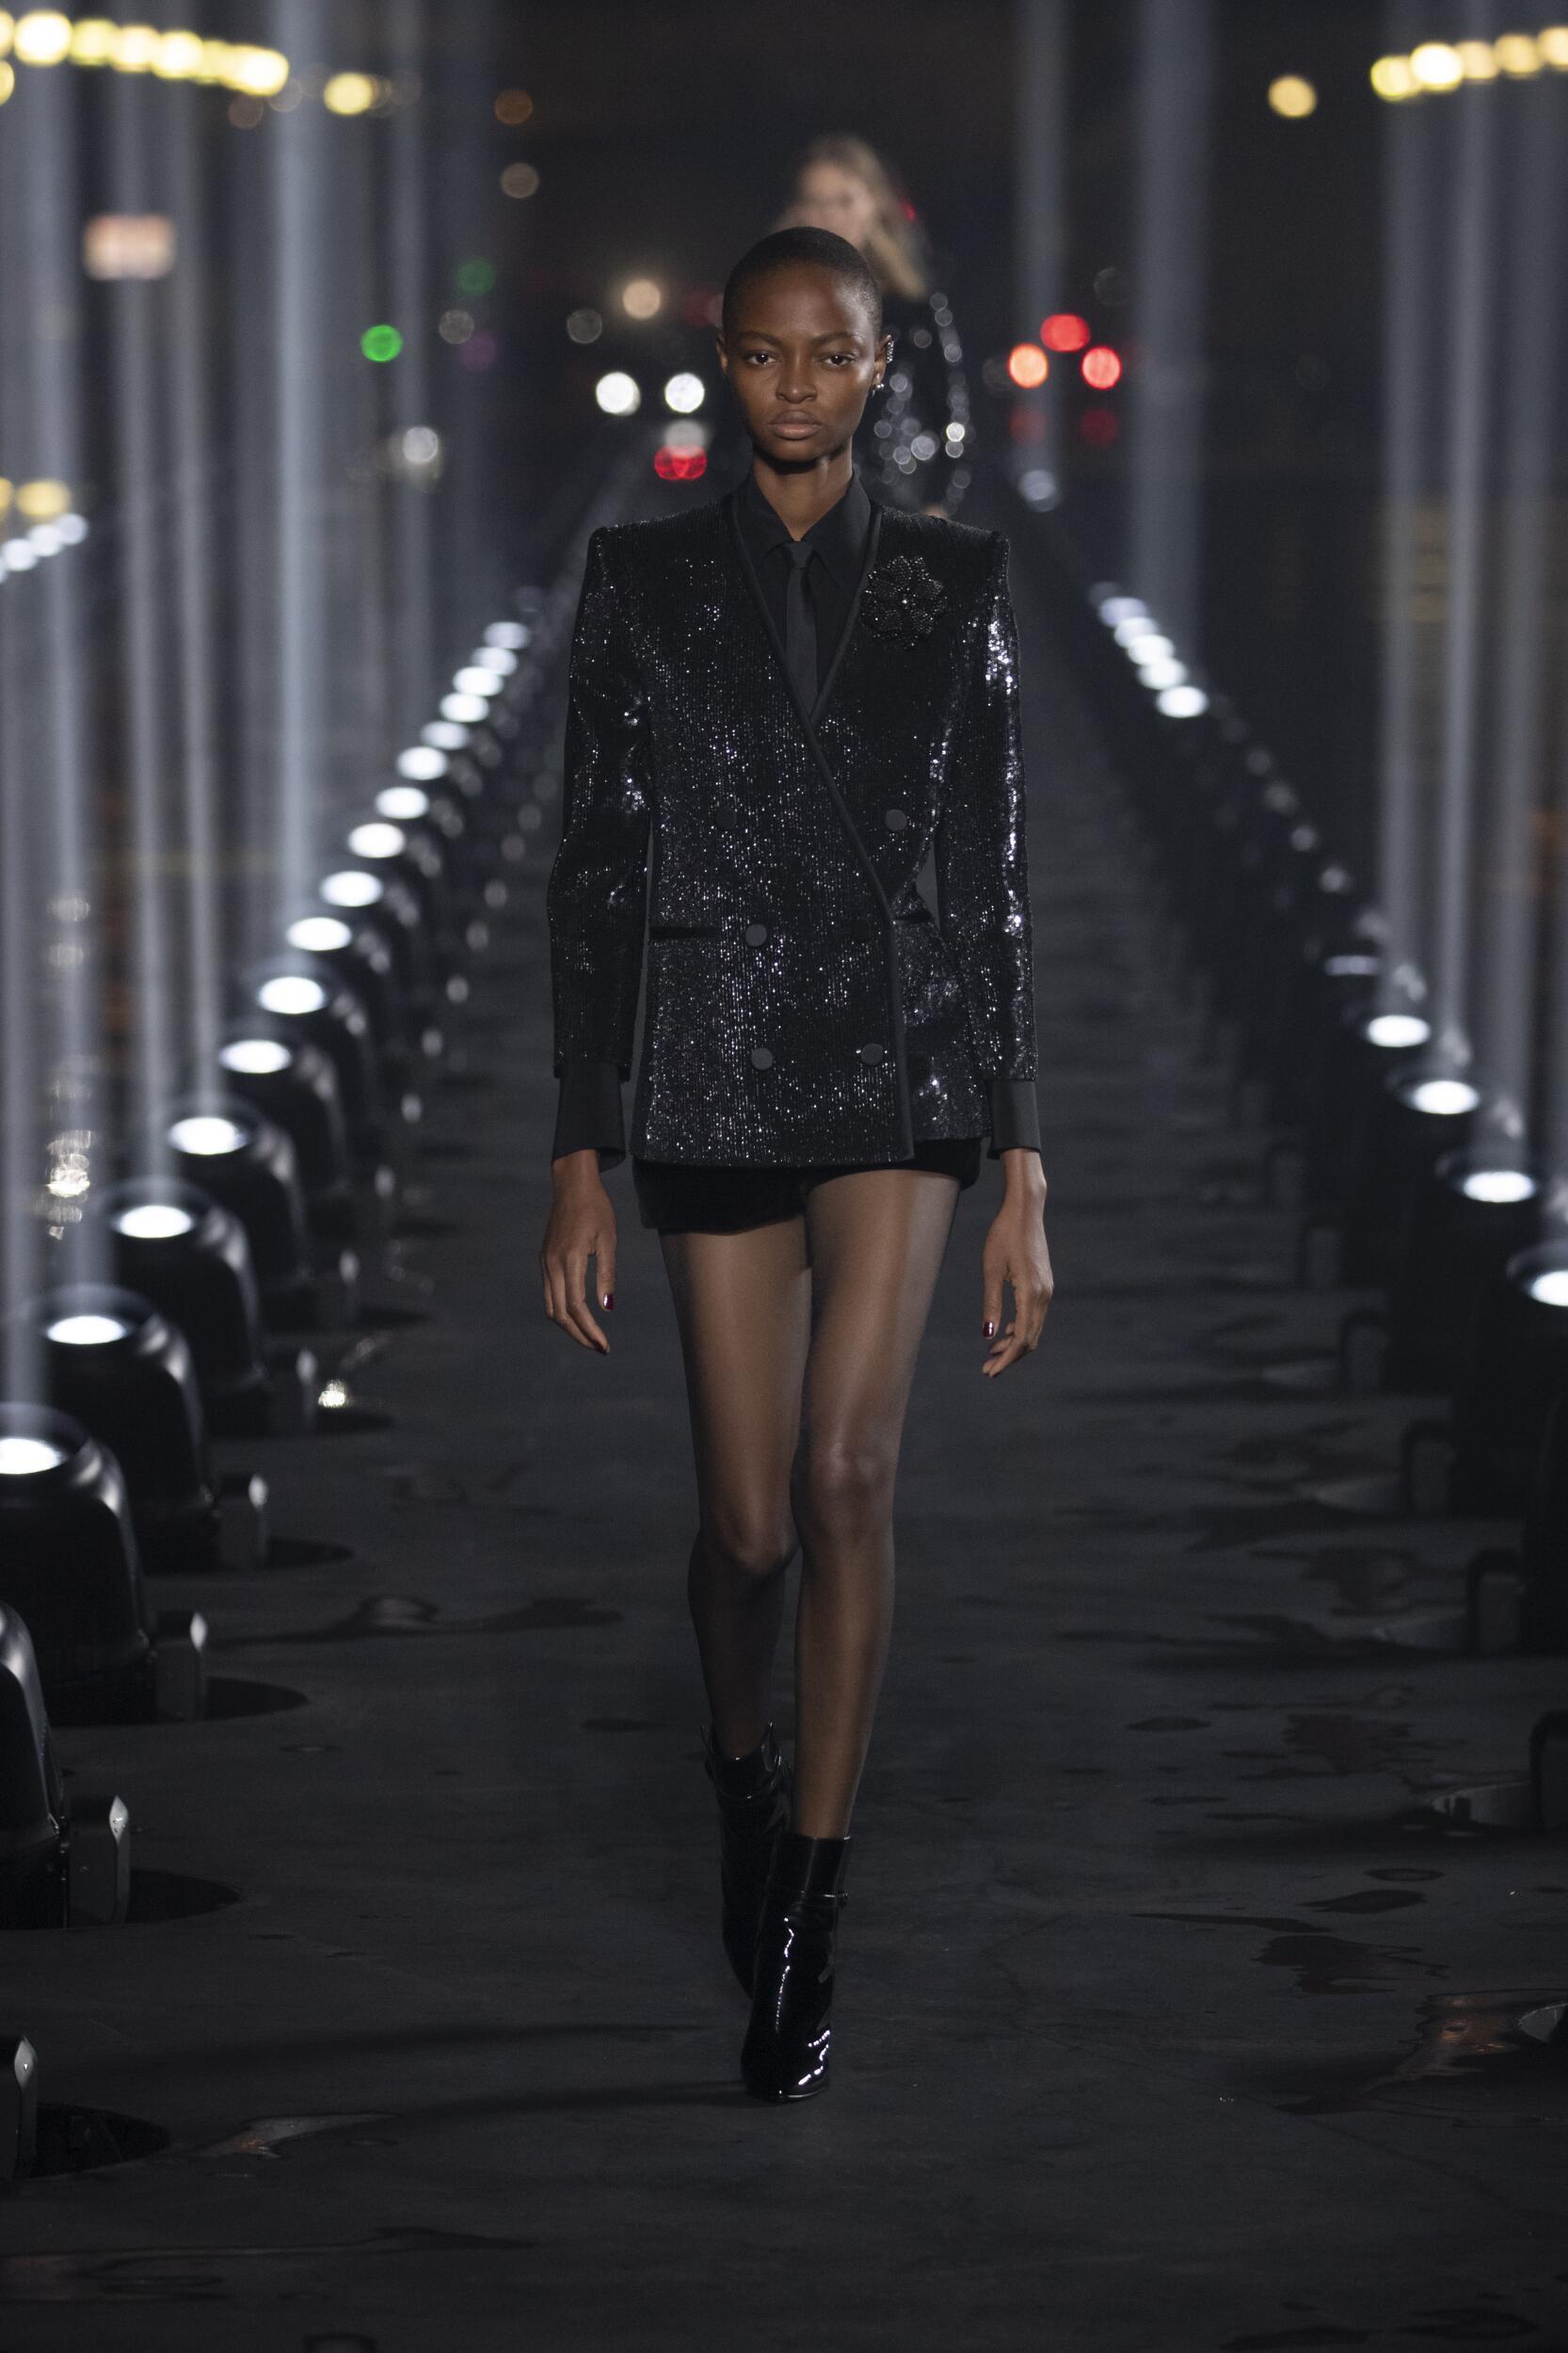 Womenswear Fashion 2020 Catwalk Saint Laurent